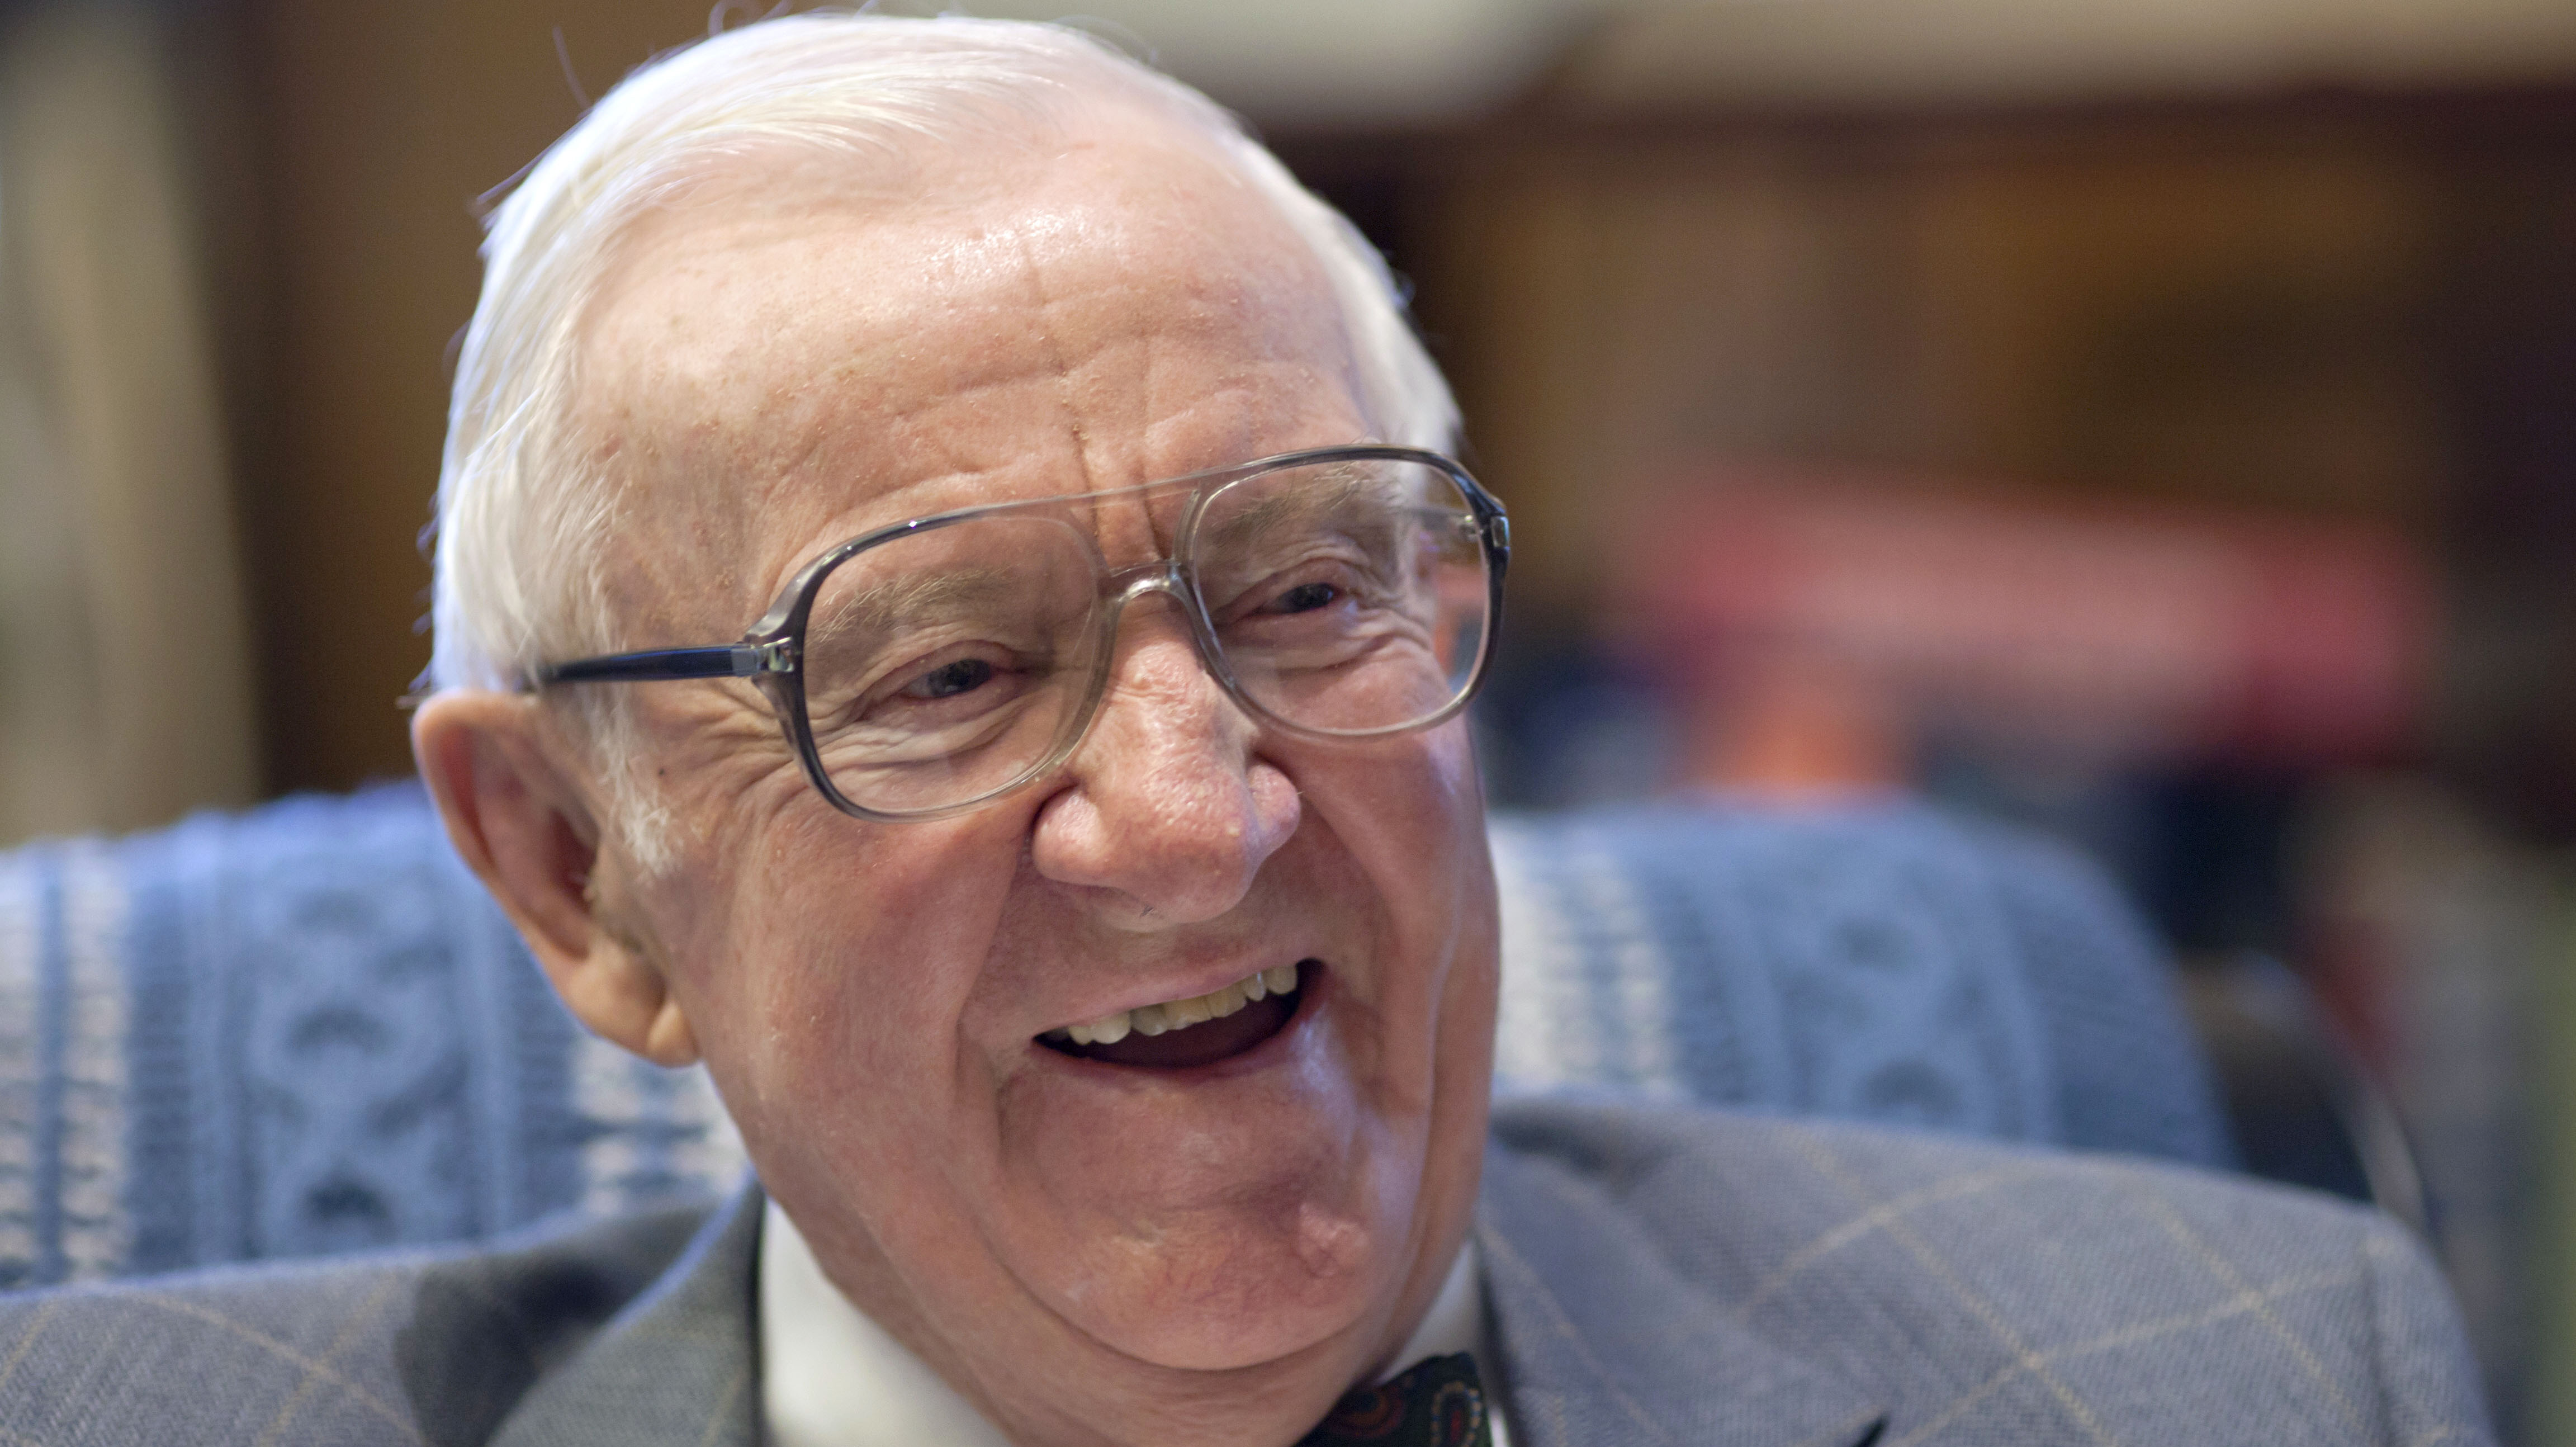 Retired Justice John Paul Stevens, A Maverick On The Bench, Dies At 99